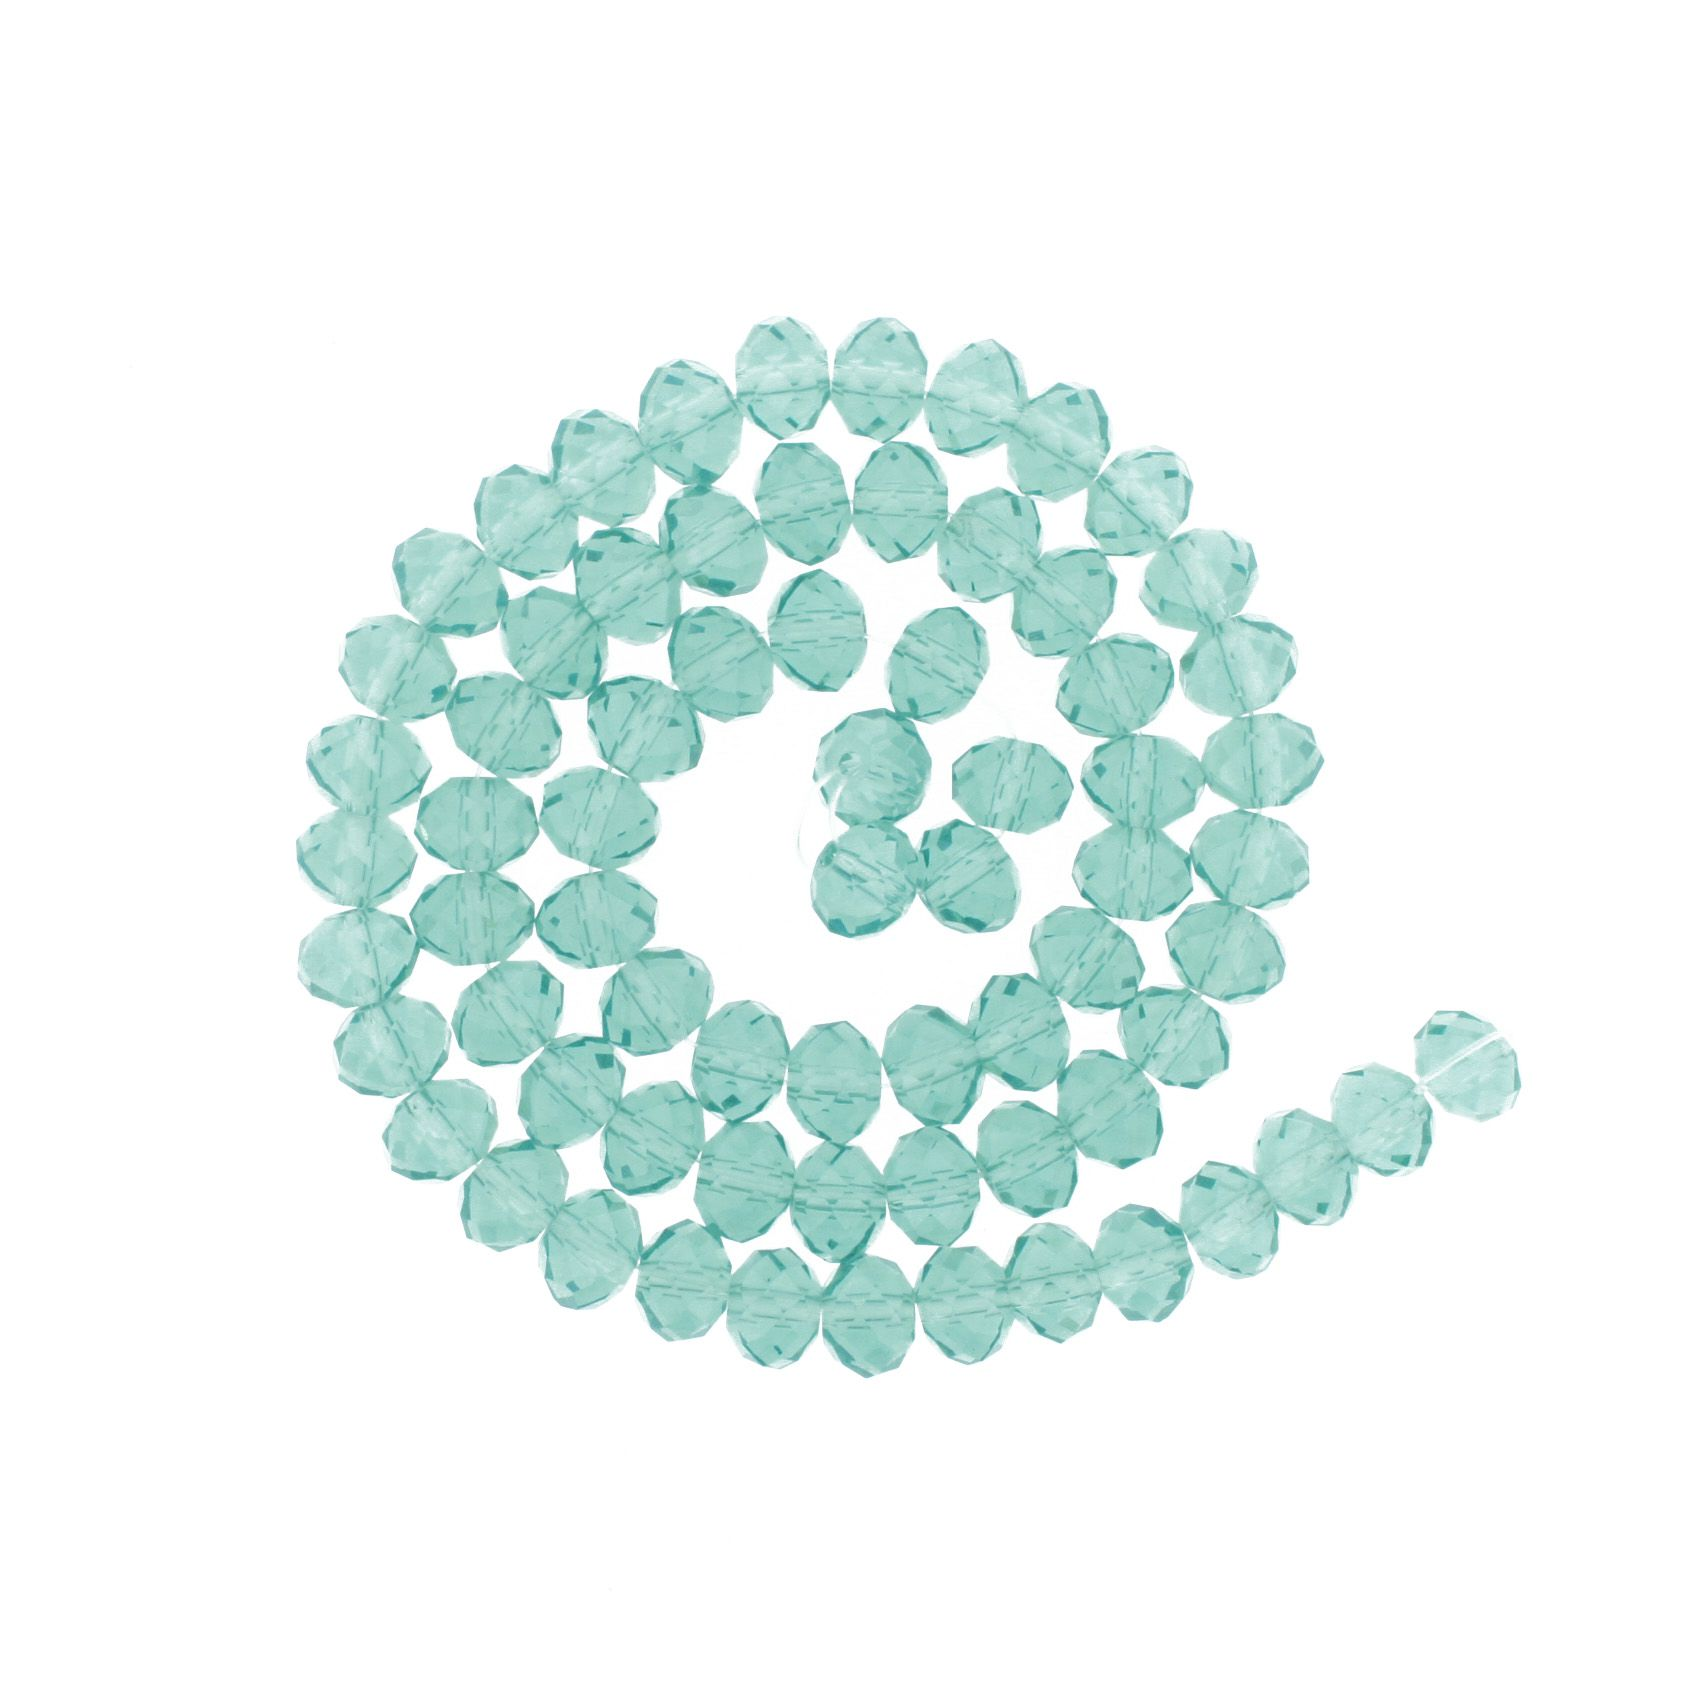 Fio de Cristal - Flat® - Aquamarine - 8mm  - Stéphanie Bijoux® - Peças para Bijuterias e Artesanato